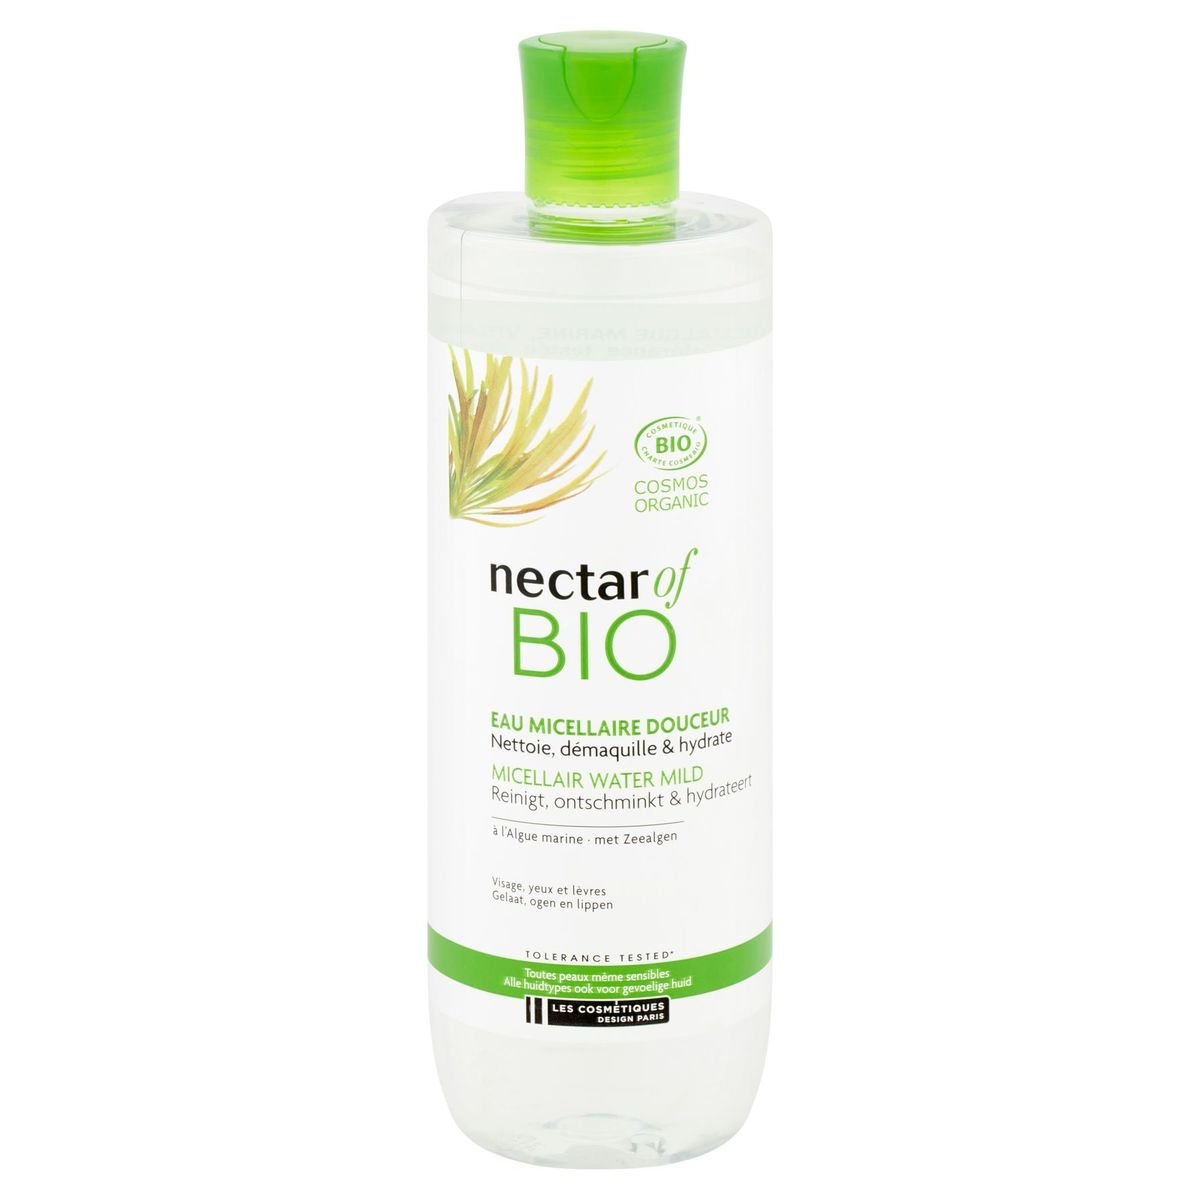 Nectar of Bio Micellair Water Mild 400 ml